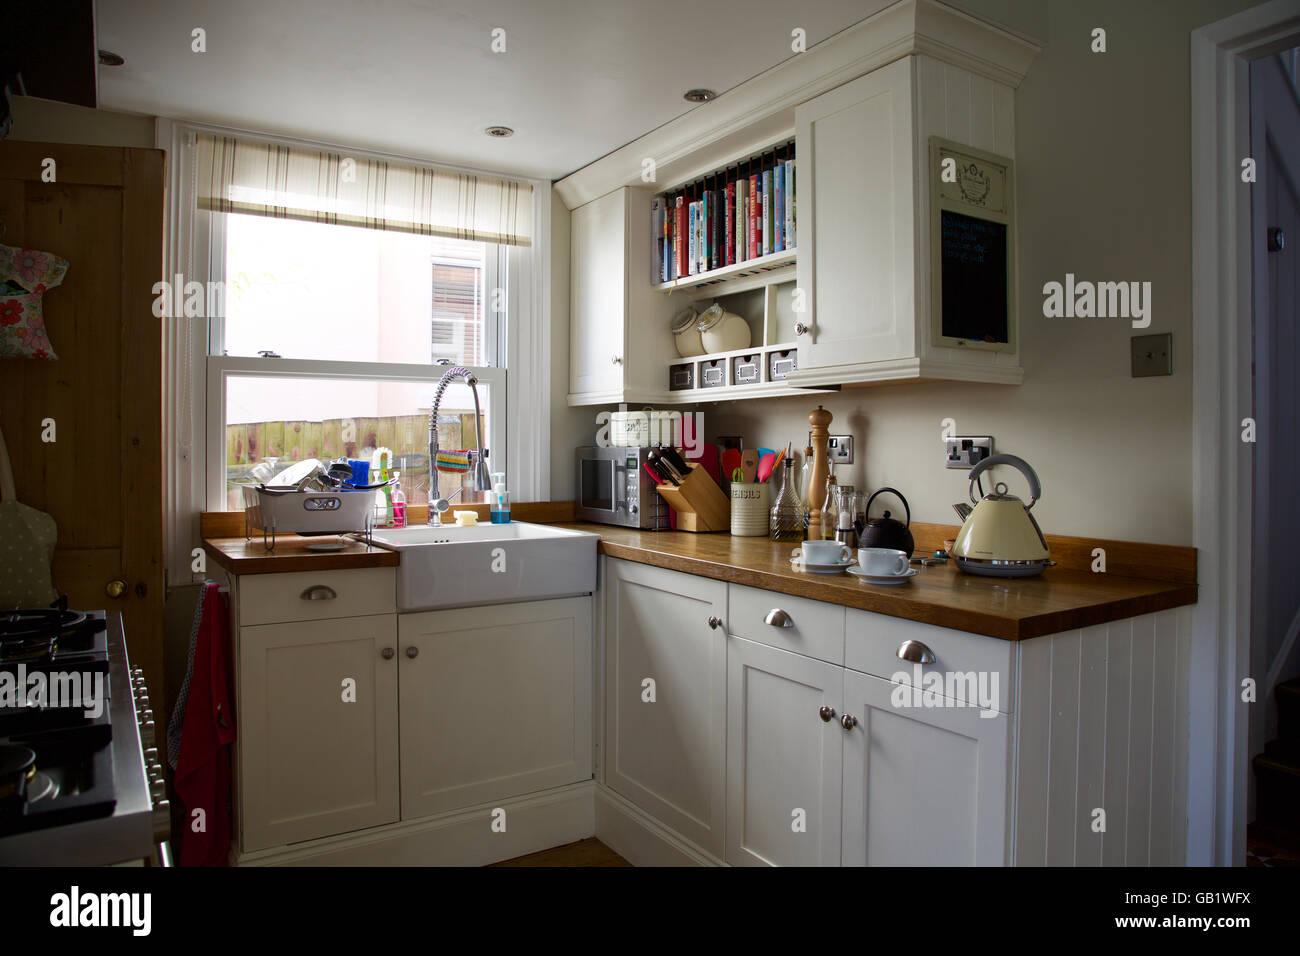 Victorian kitchen corner with window in real family home kettle tea cup pot sink cream cupboards worktop breakfast - Stock Image